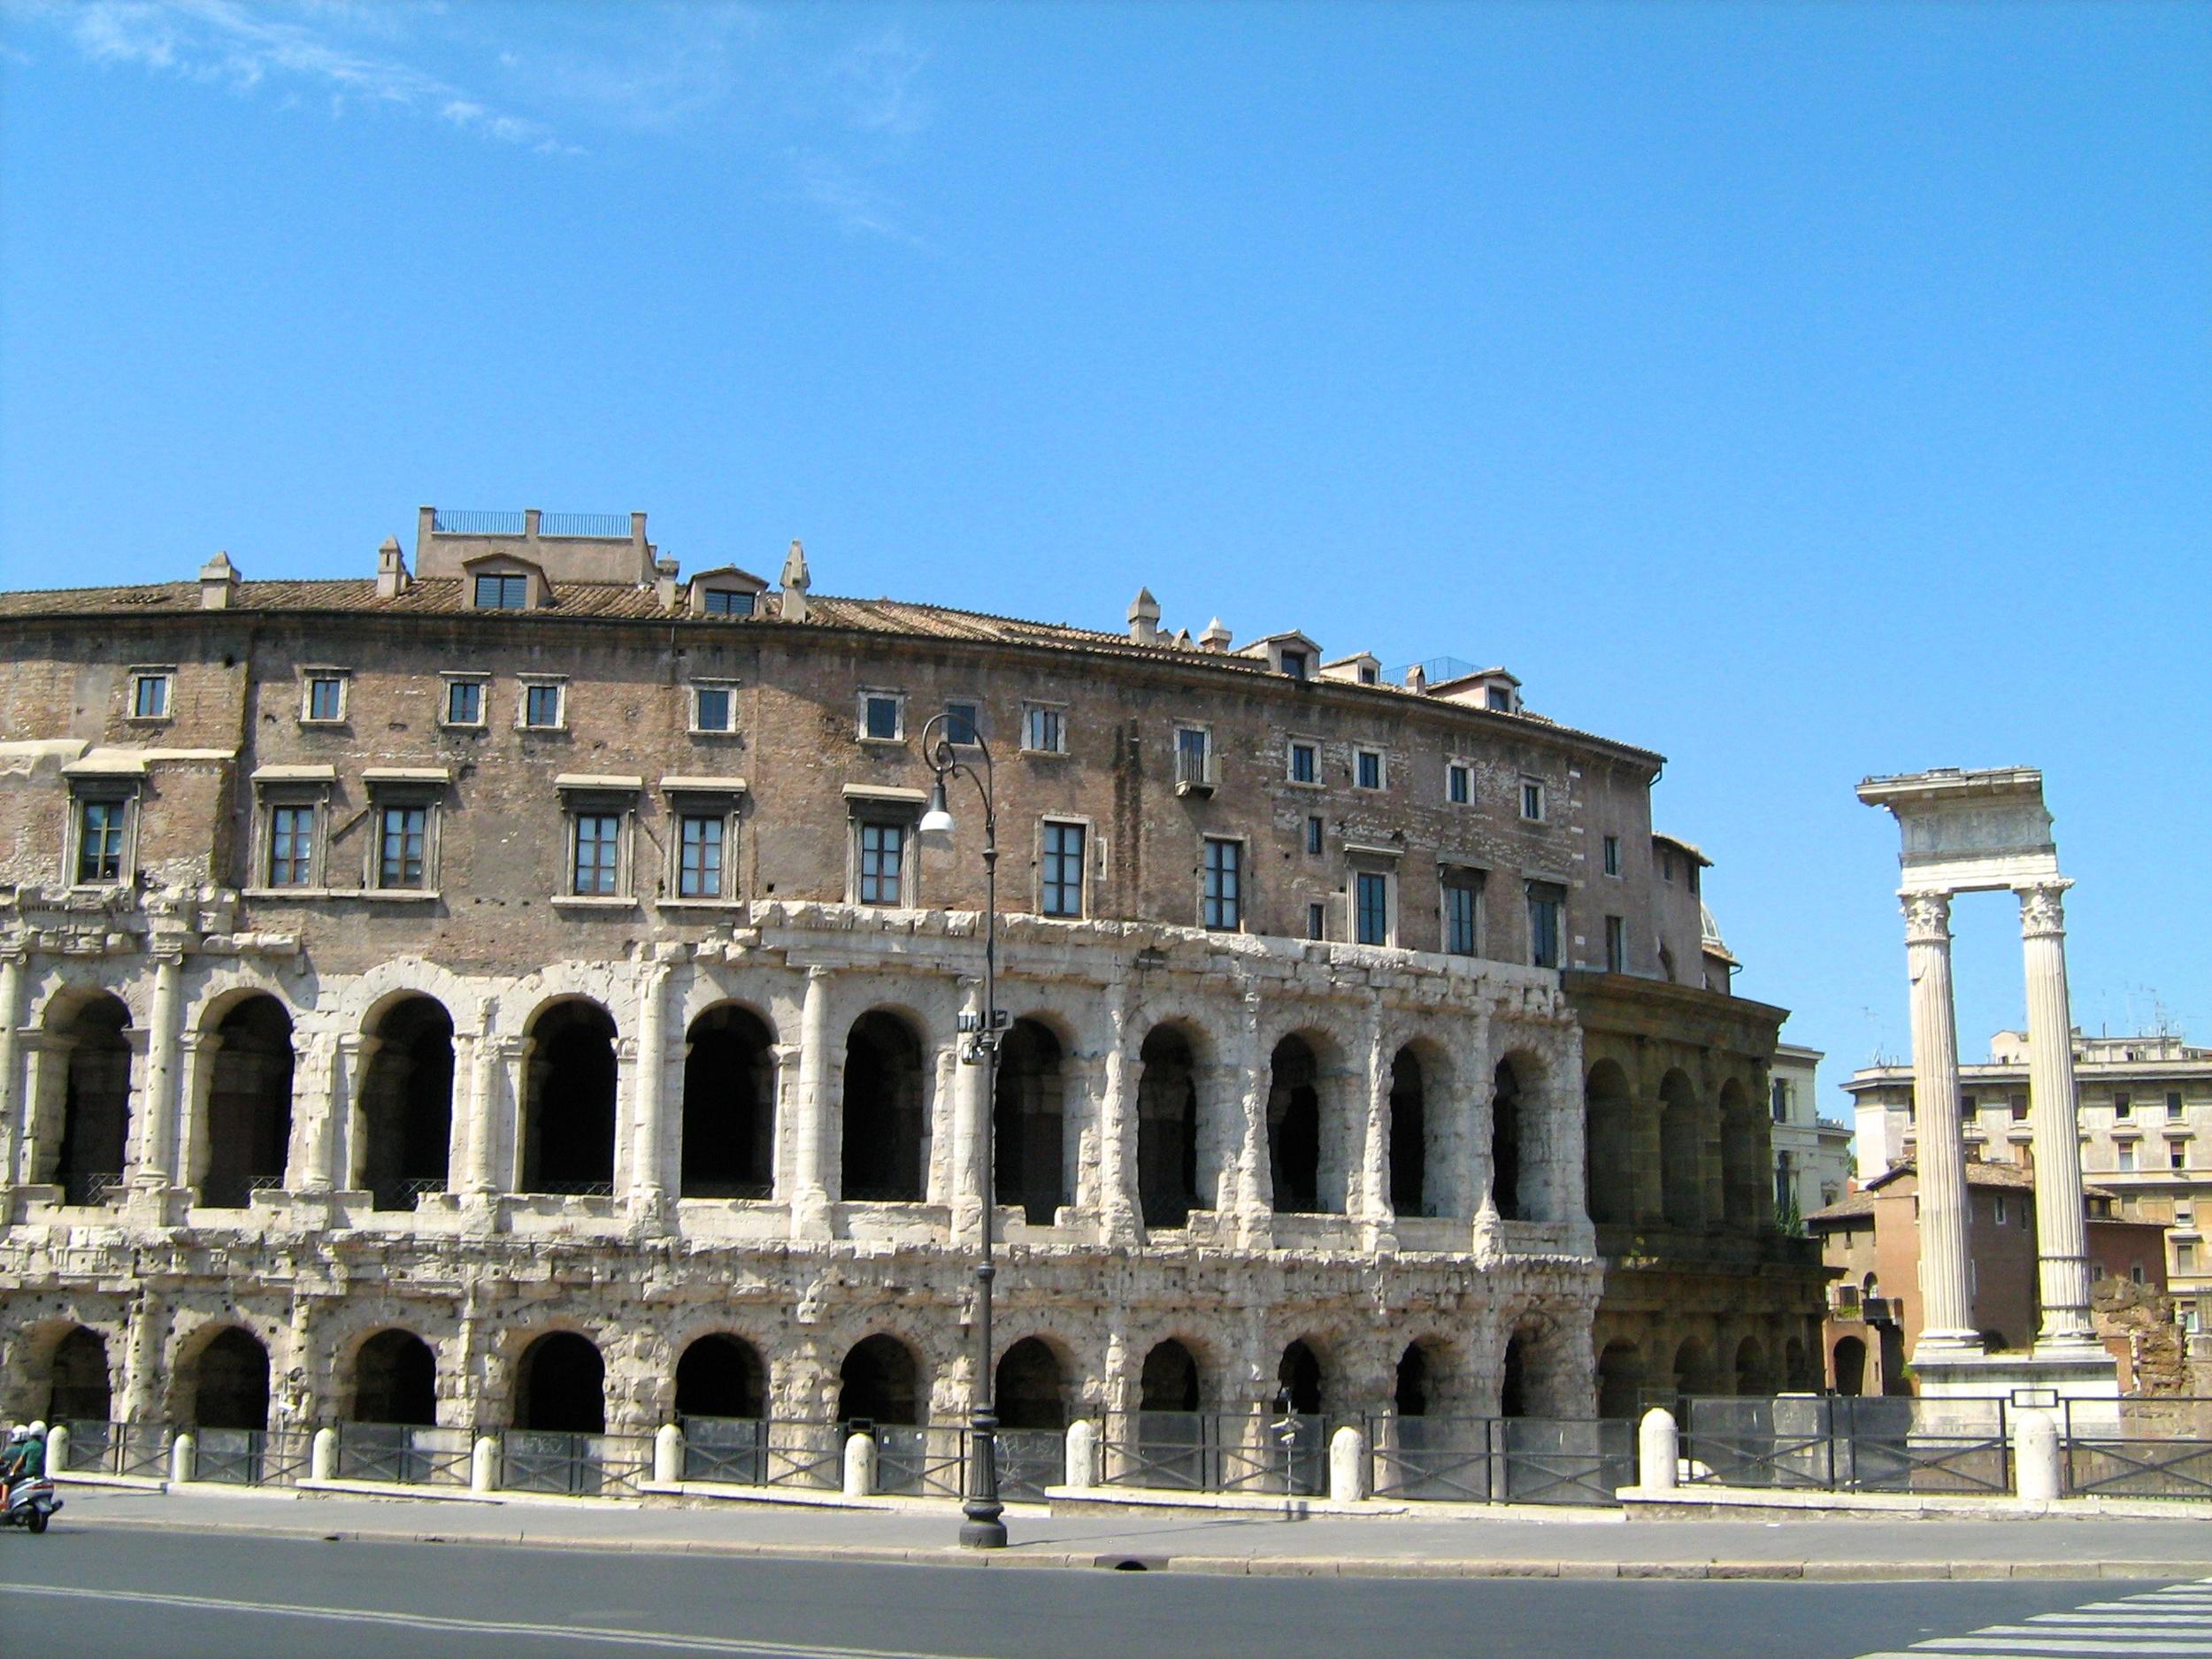 CRO Italy web 2013 - 078.jpg